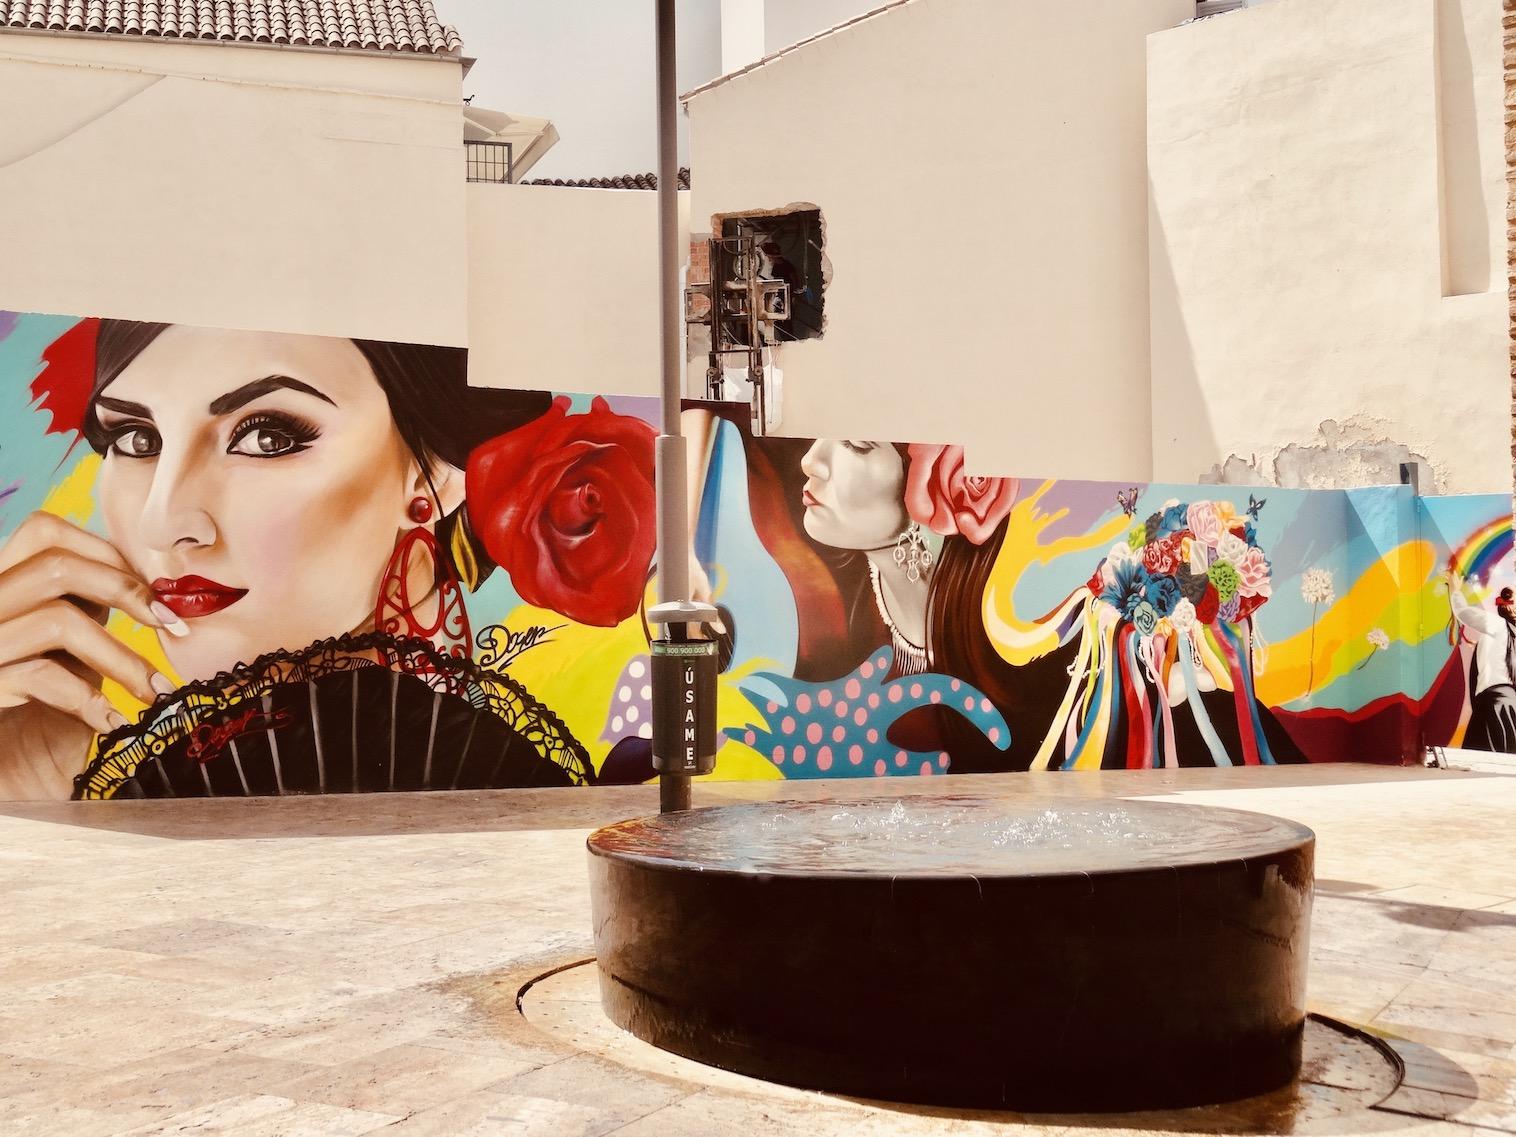 Visit Malaga Malaga street art.